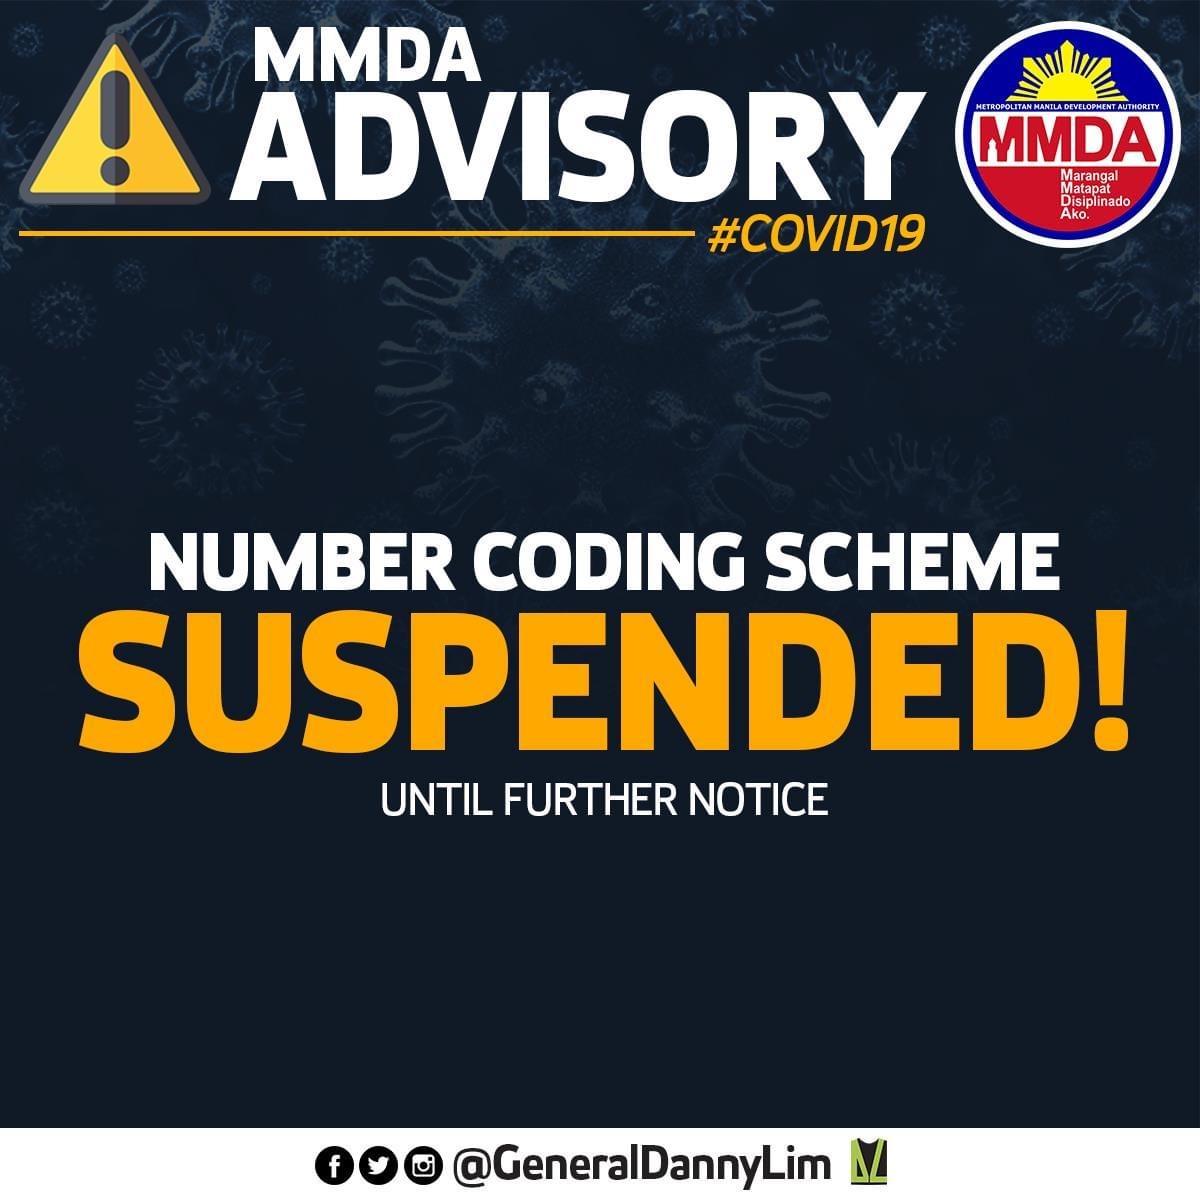 MMDA Advisory re Number Coding Scheme Suspended in Metro Manila